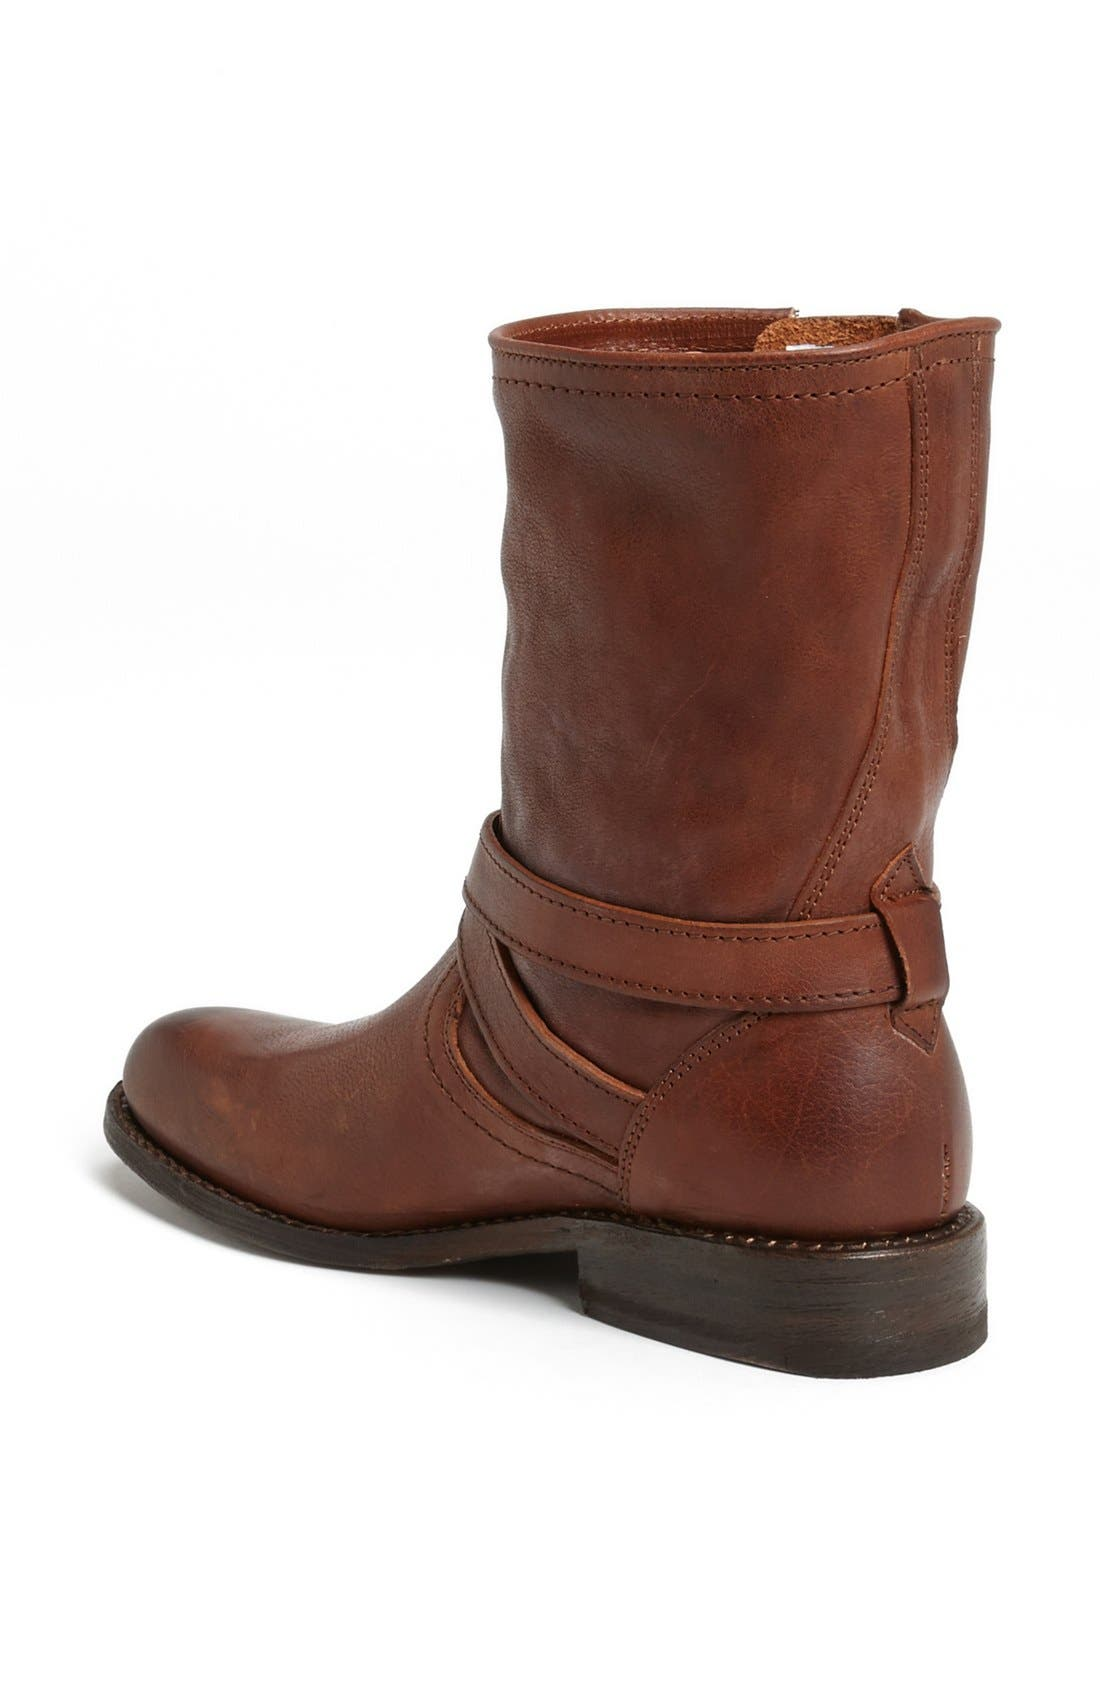 Alternate Image 2  - Frye 'Jayden Cross Engineer' Leather Boot